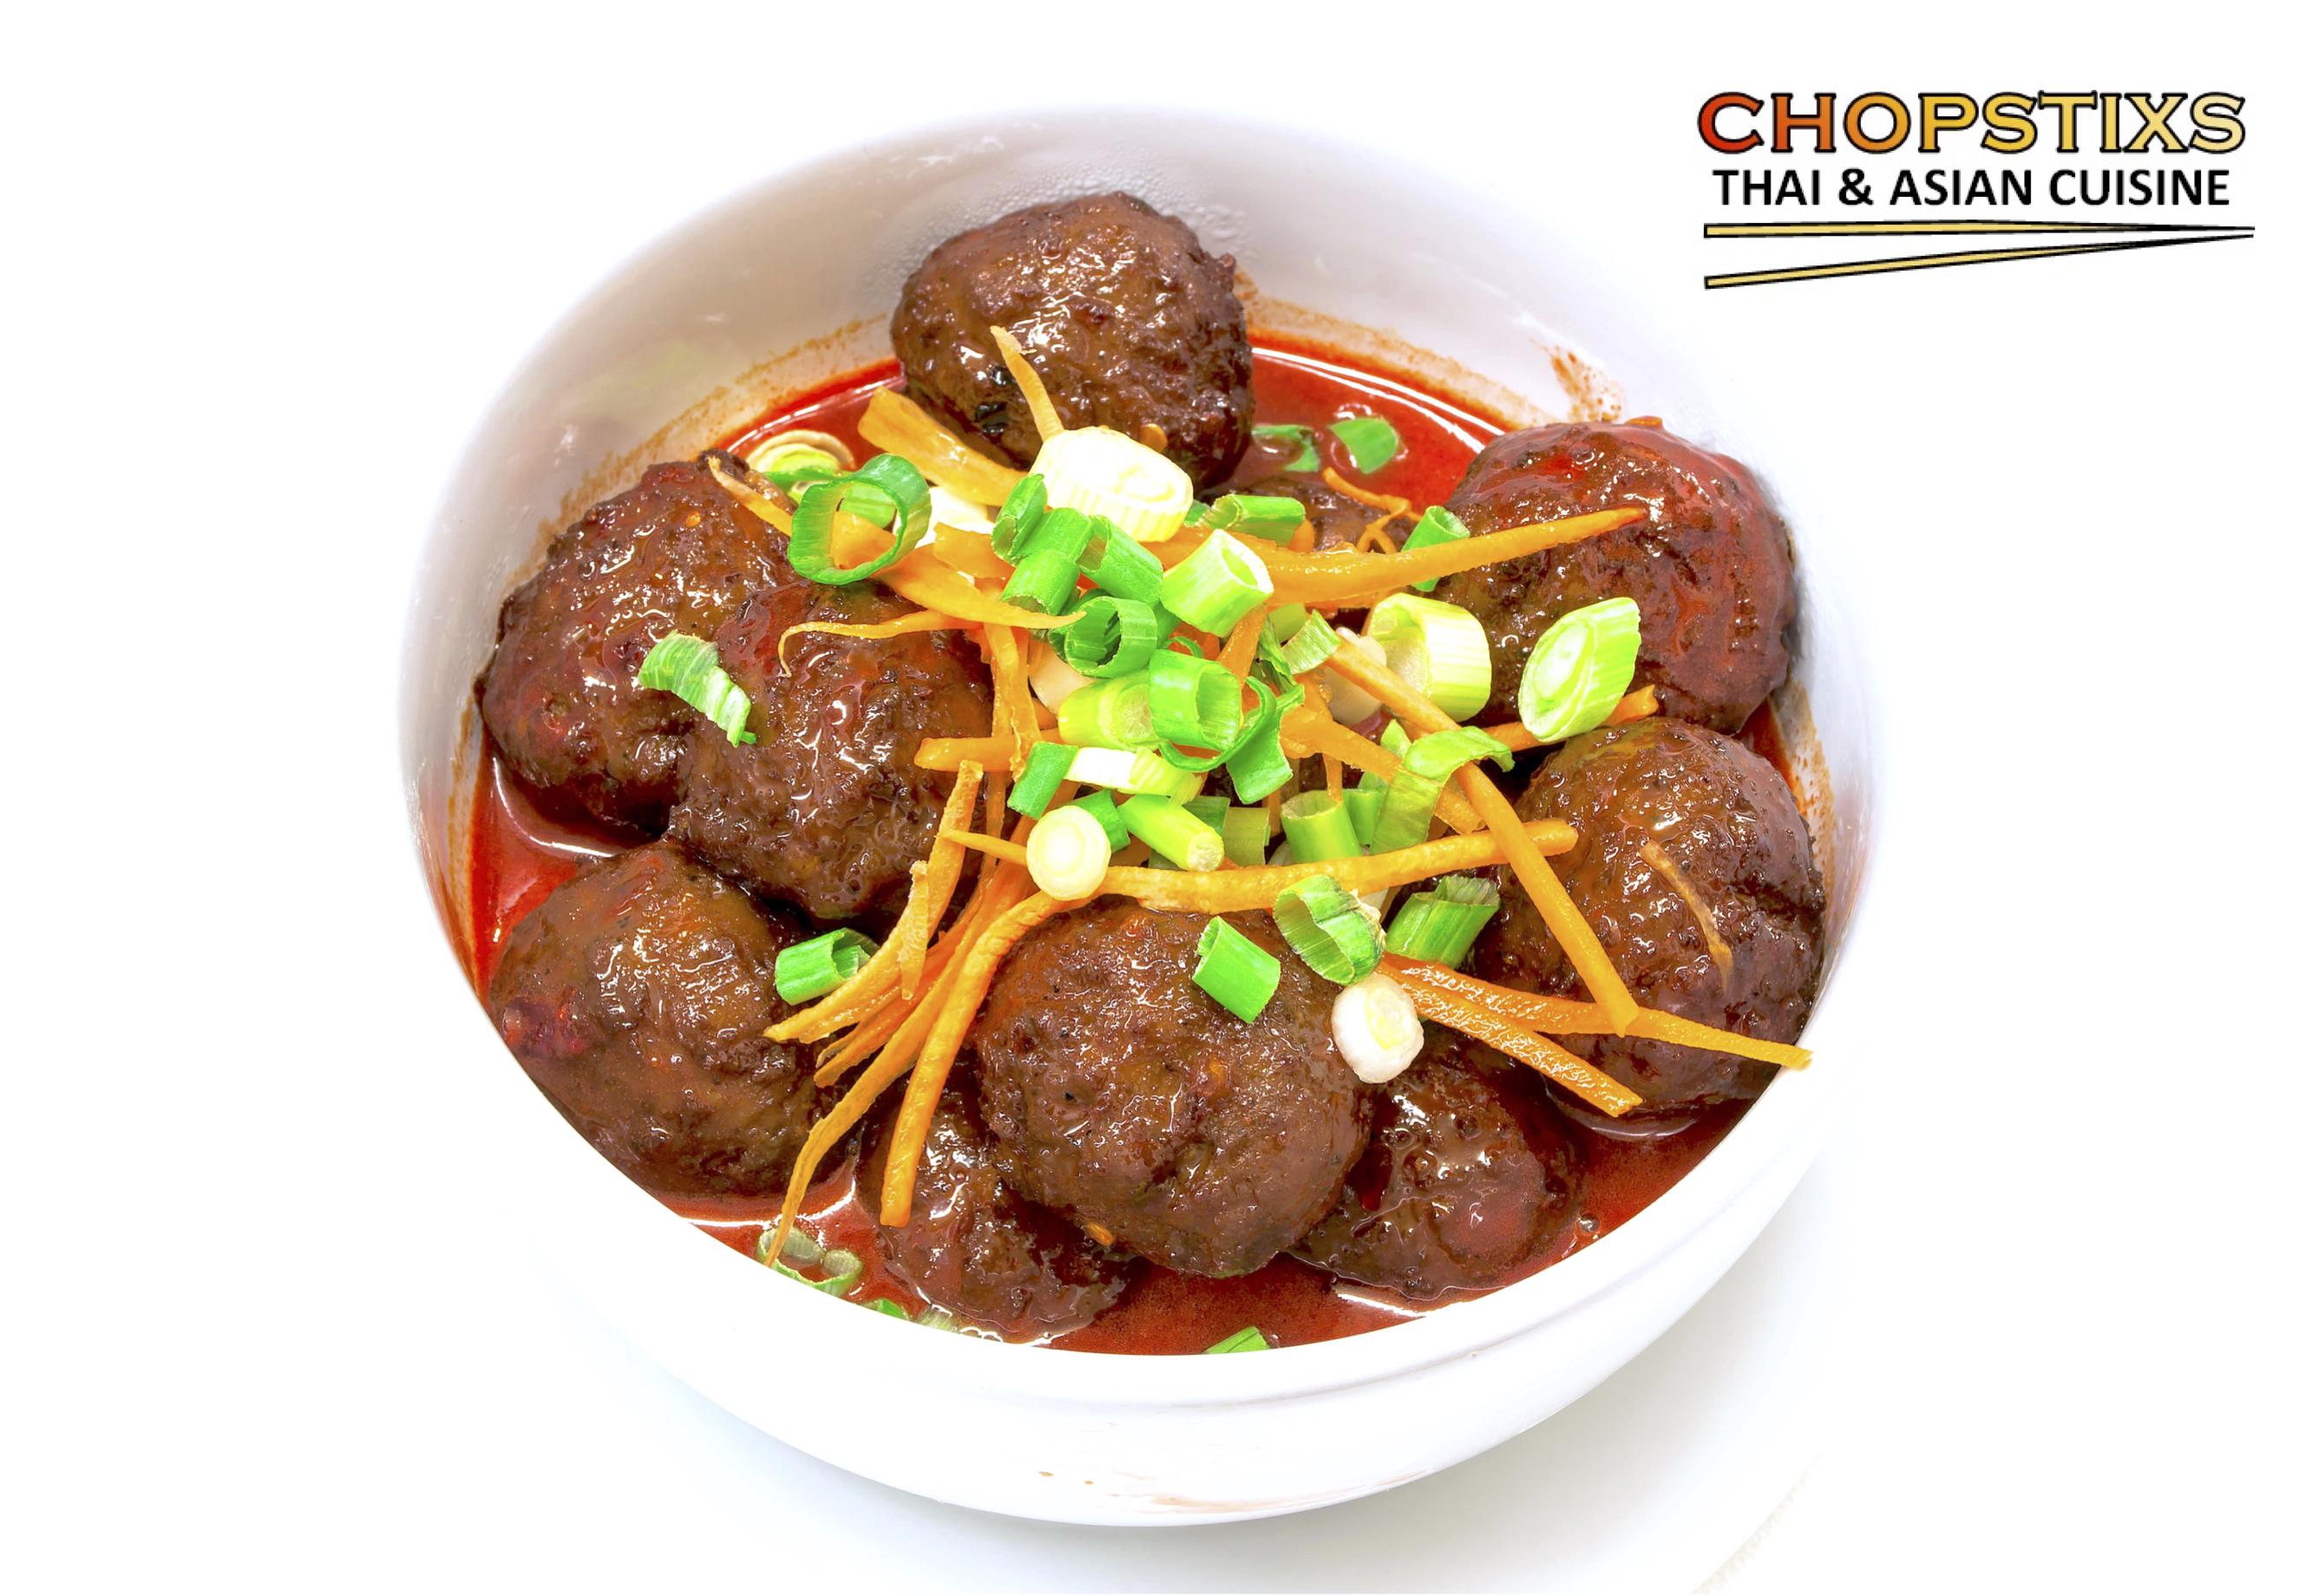 Spicy Meat Balls (14 Pcs.) Image